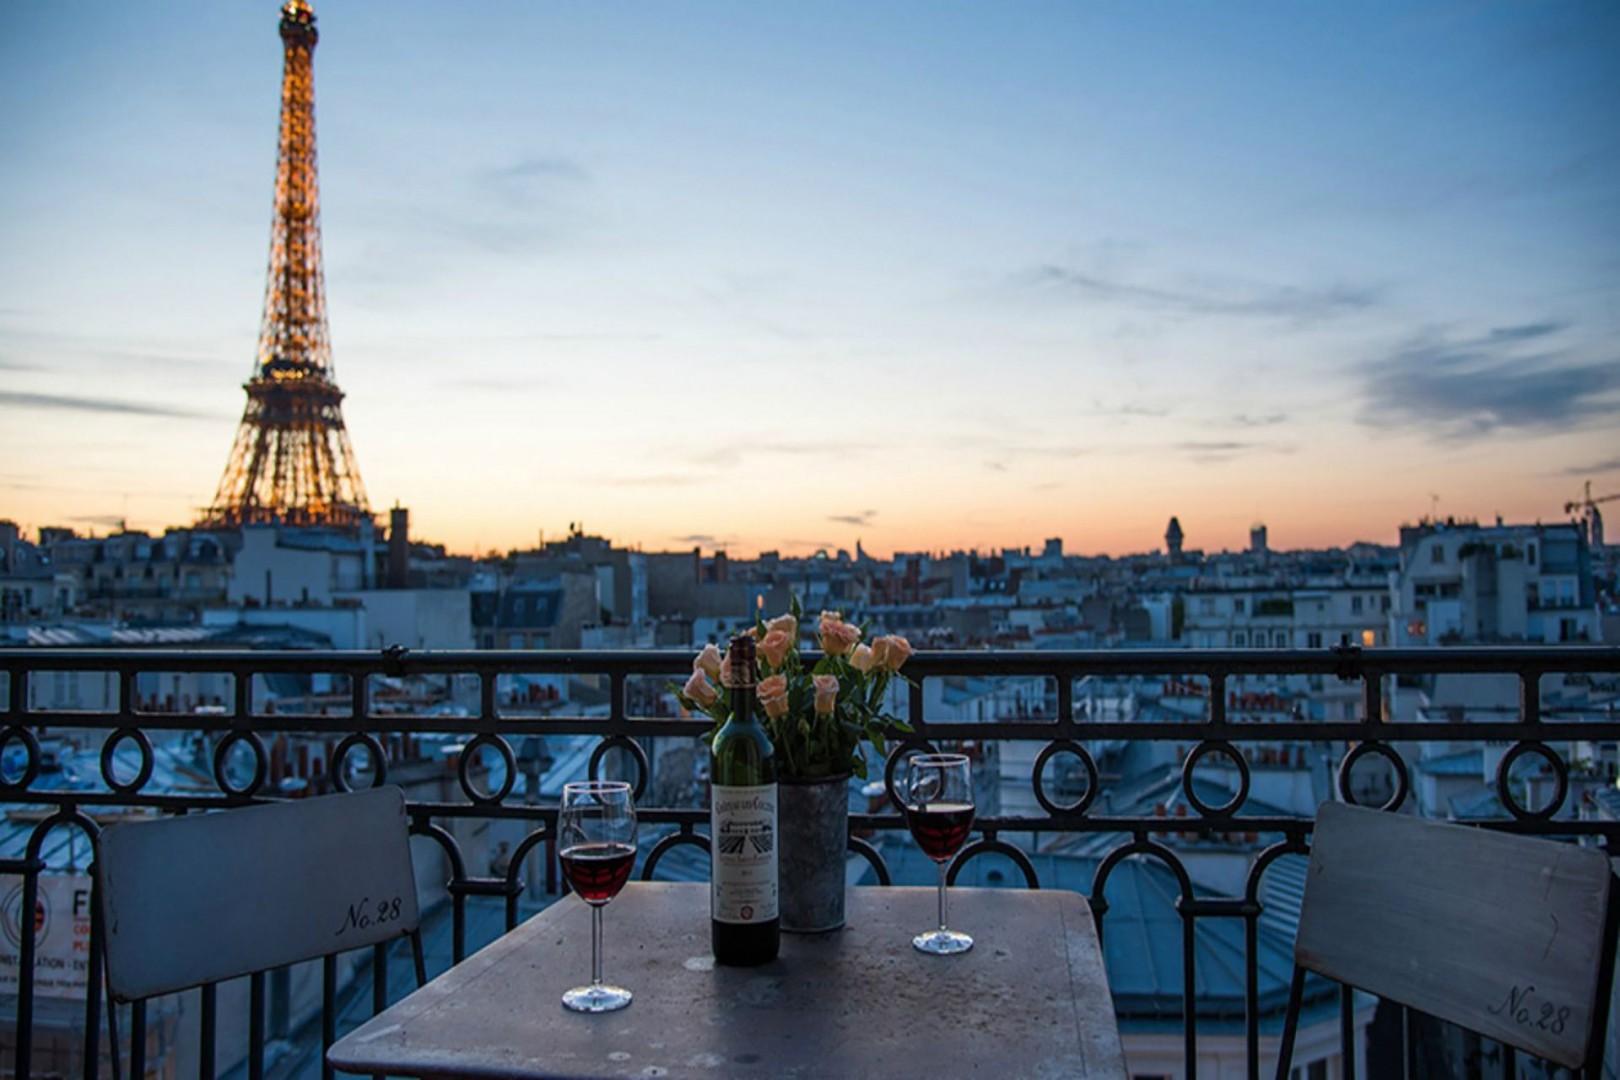 Enjoy unforgettable Eiffel Tower views while dining al fresco.